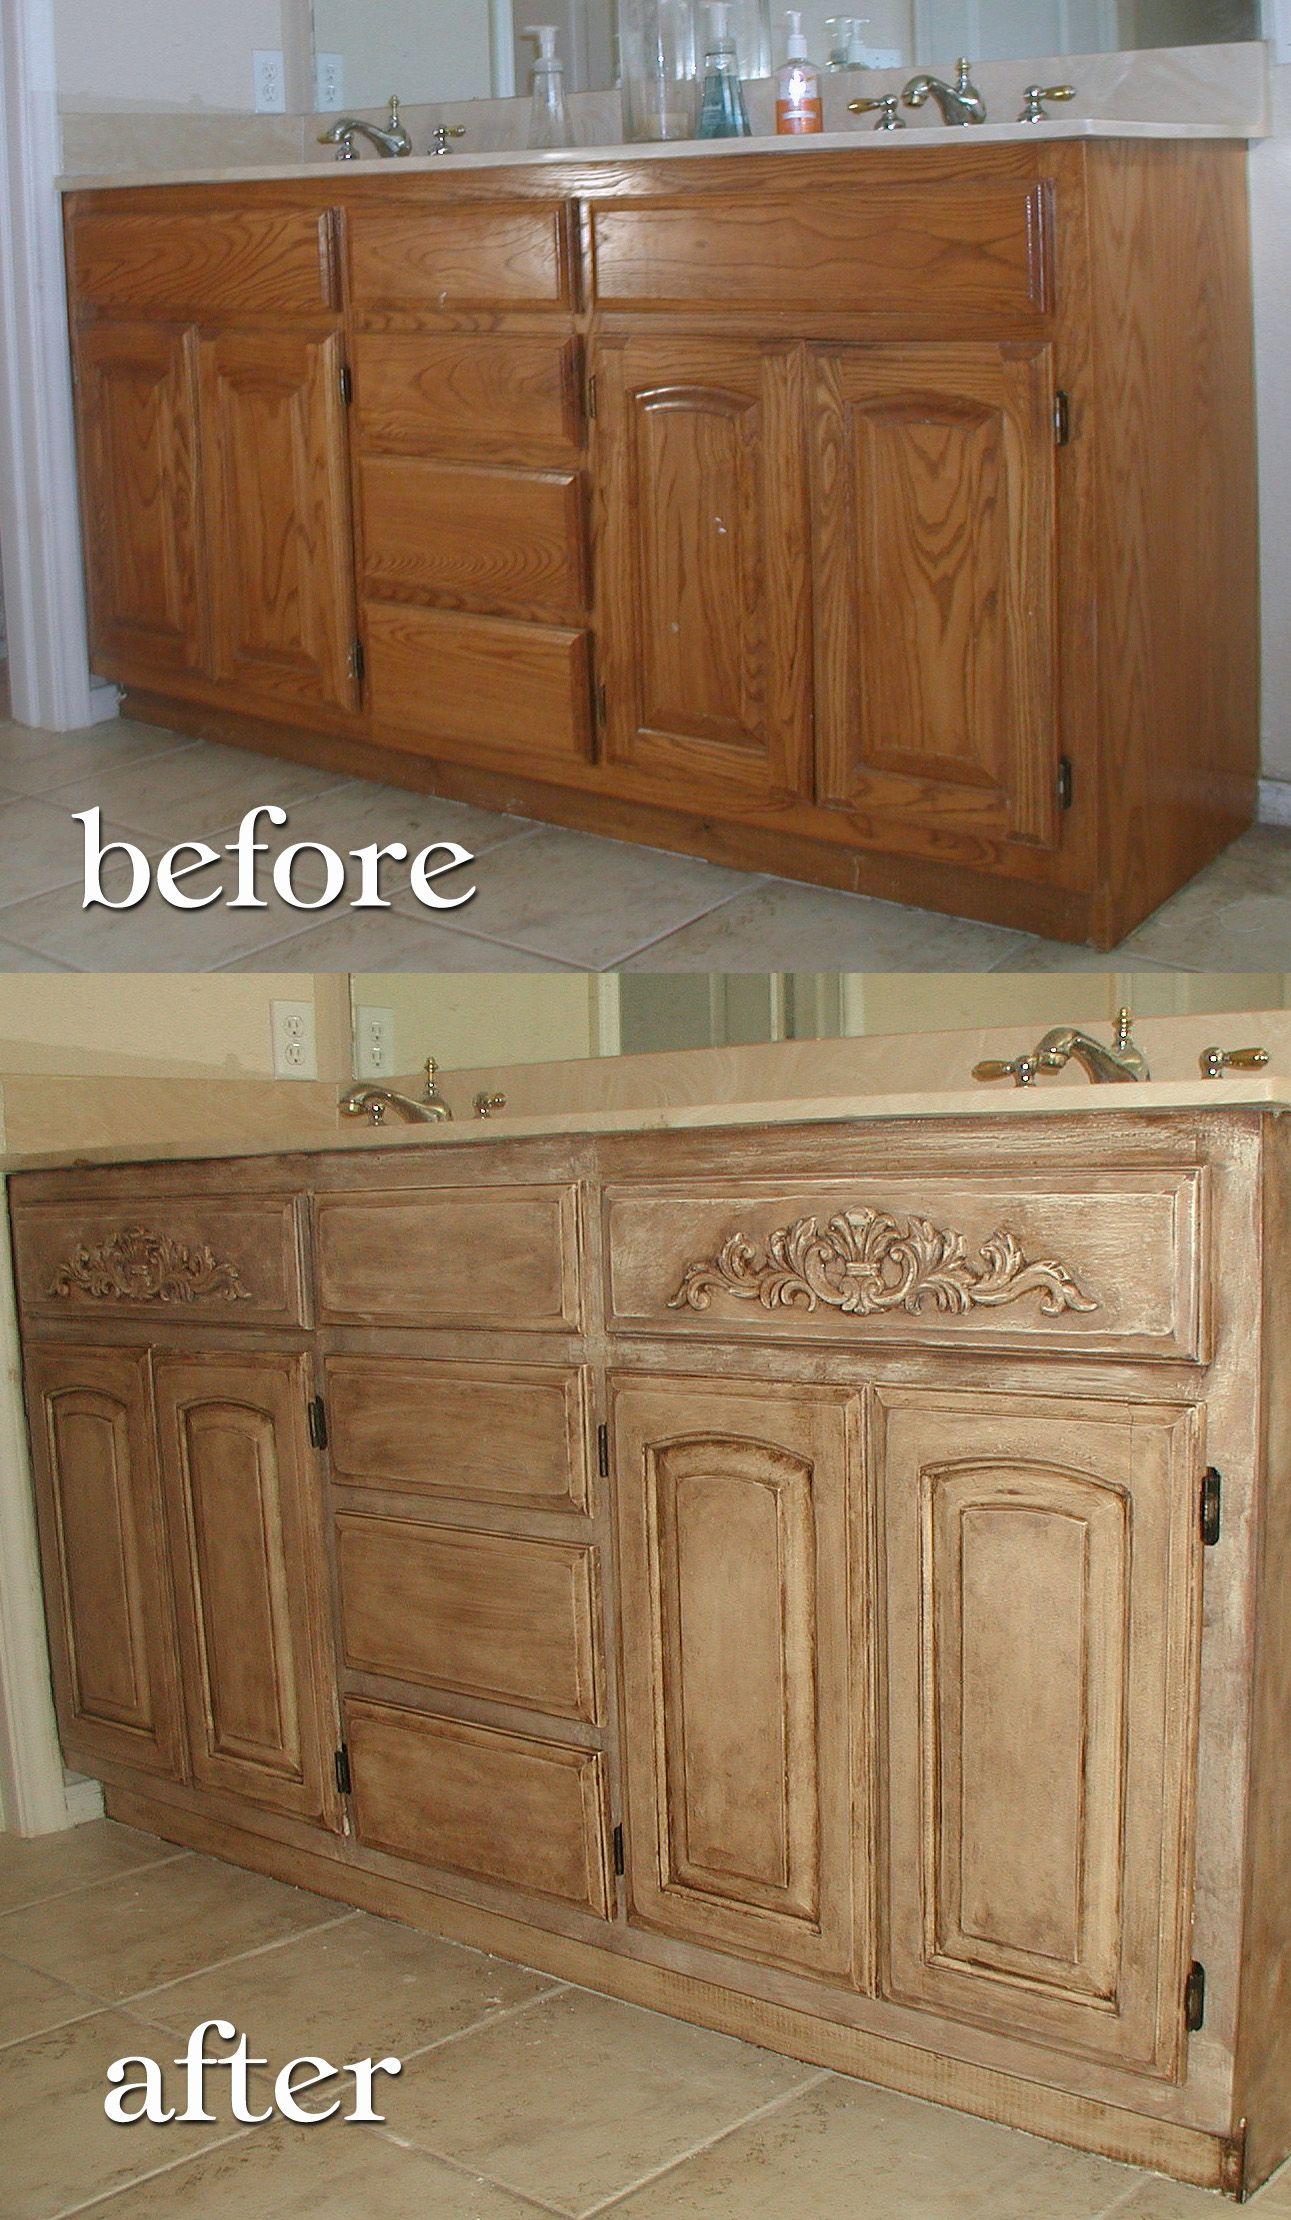 Wordpress Com Painting Bathroom Cabinets Painting Bathroom Annie Sloan Chalk Paint Old White